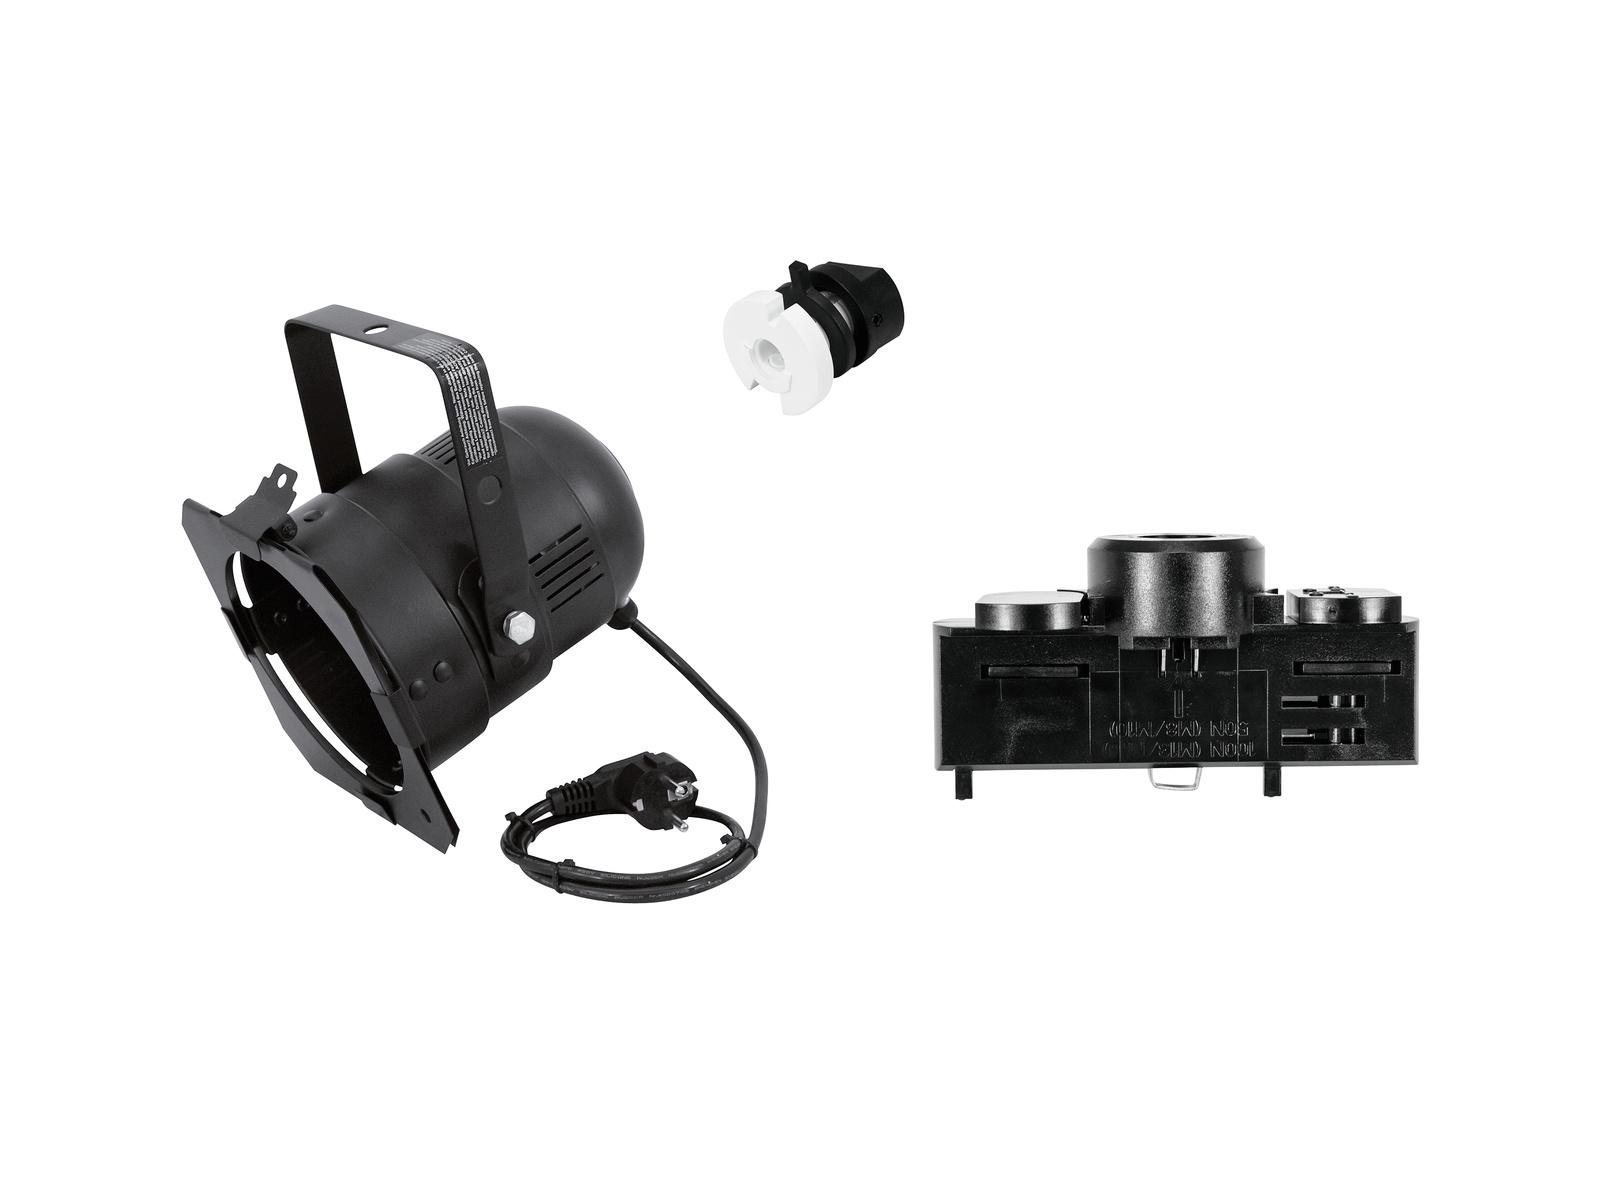 EUROLITE EUROLITE Set DIY PAR-38 Spot + Multi adapter, 3 phases, black